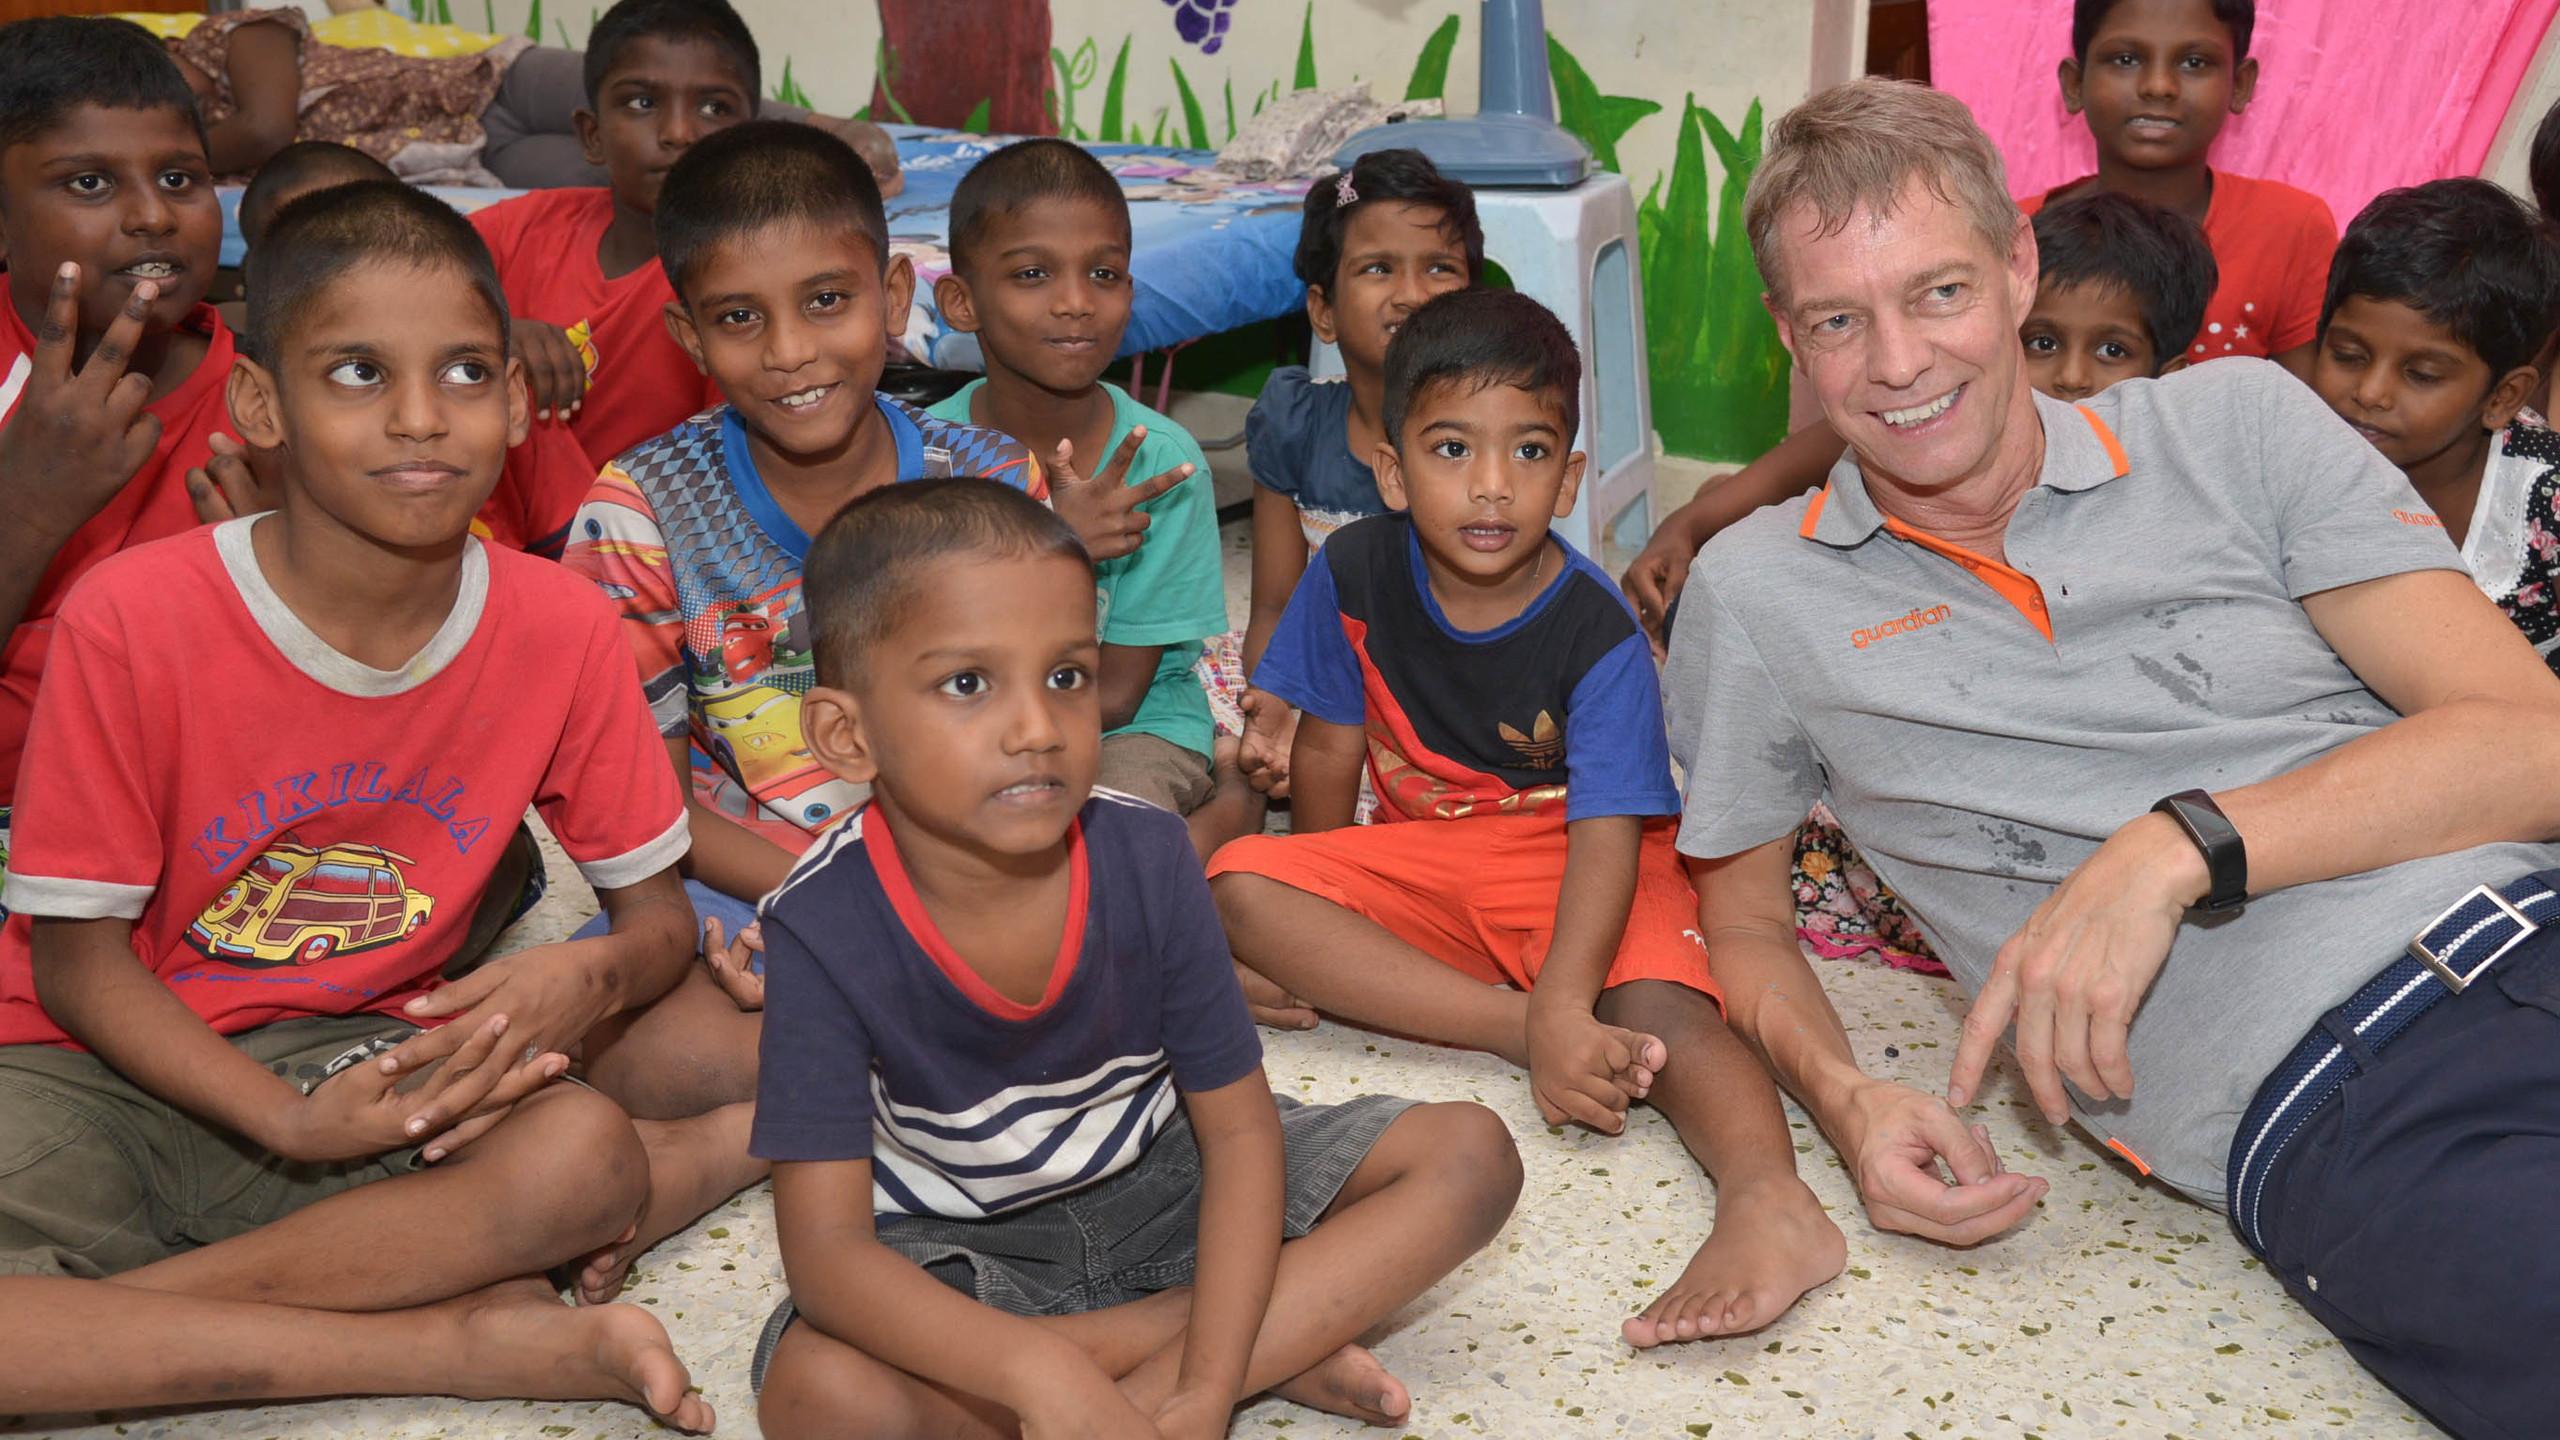 Mr Soren Lauridsen, CEO of Guardian Malaysia posing with residents of Pertubuhan   Kebajikan Anak Yatim Mary